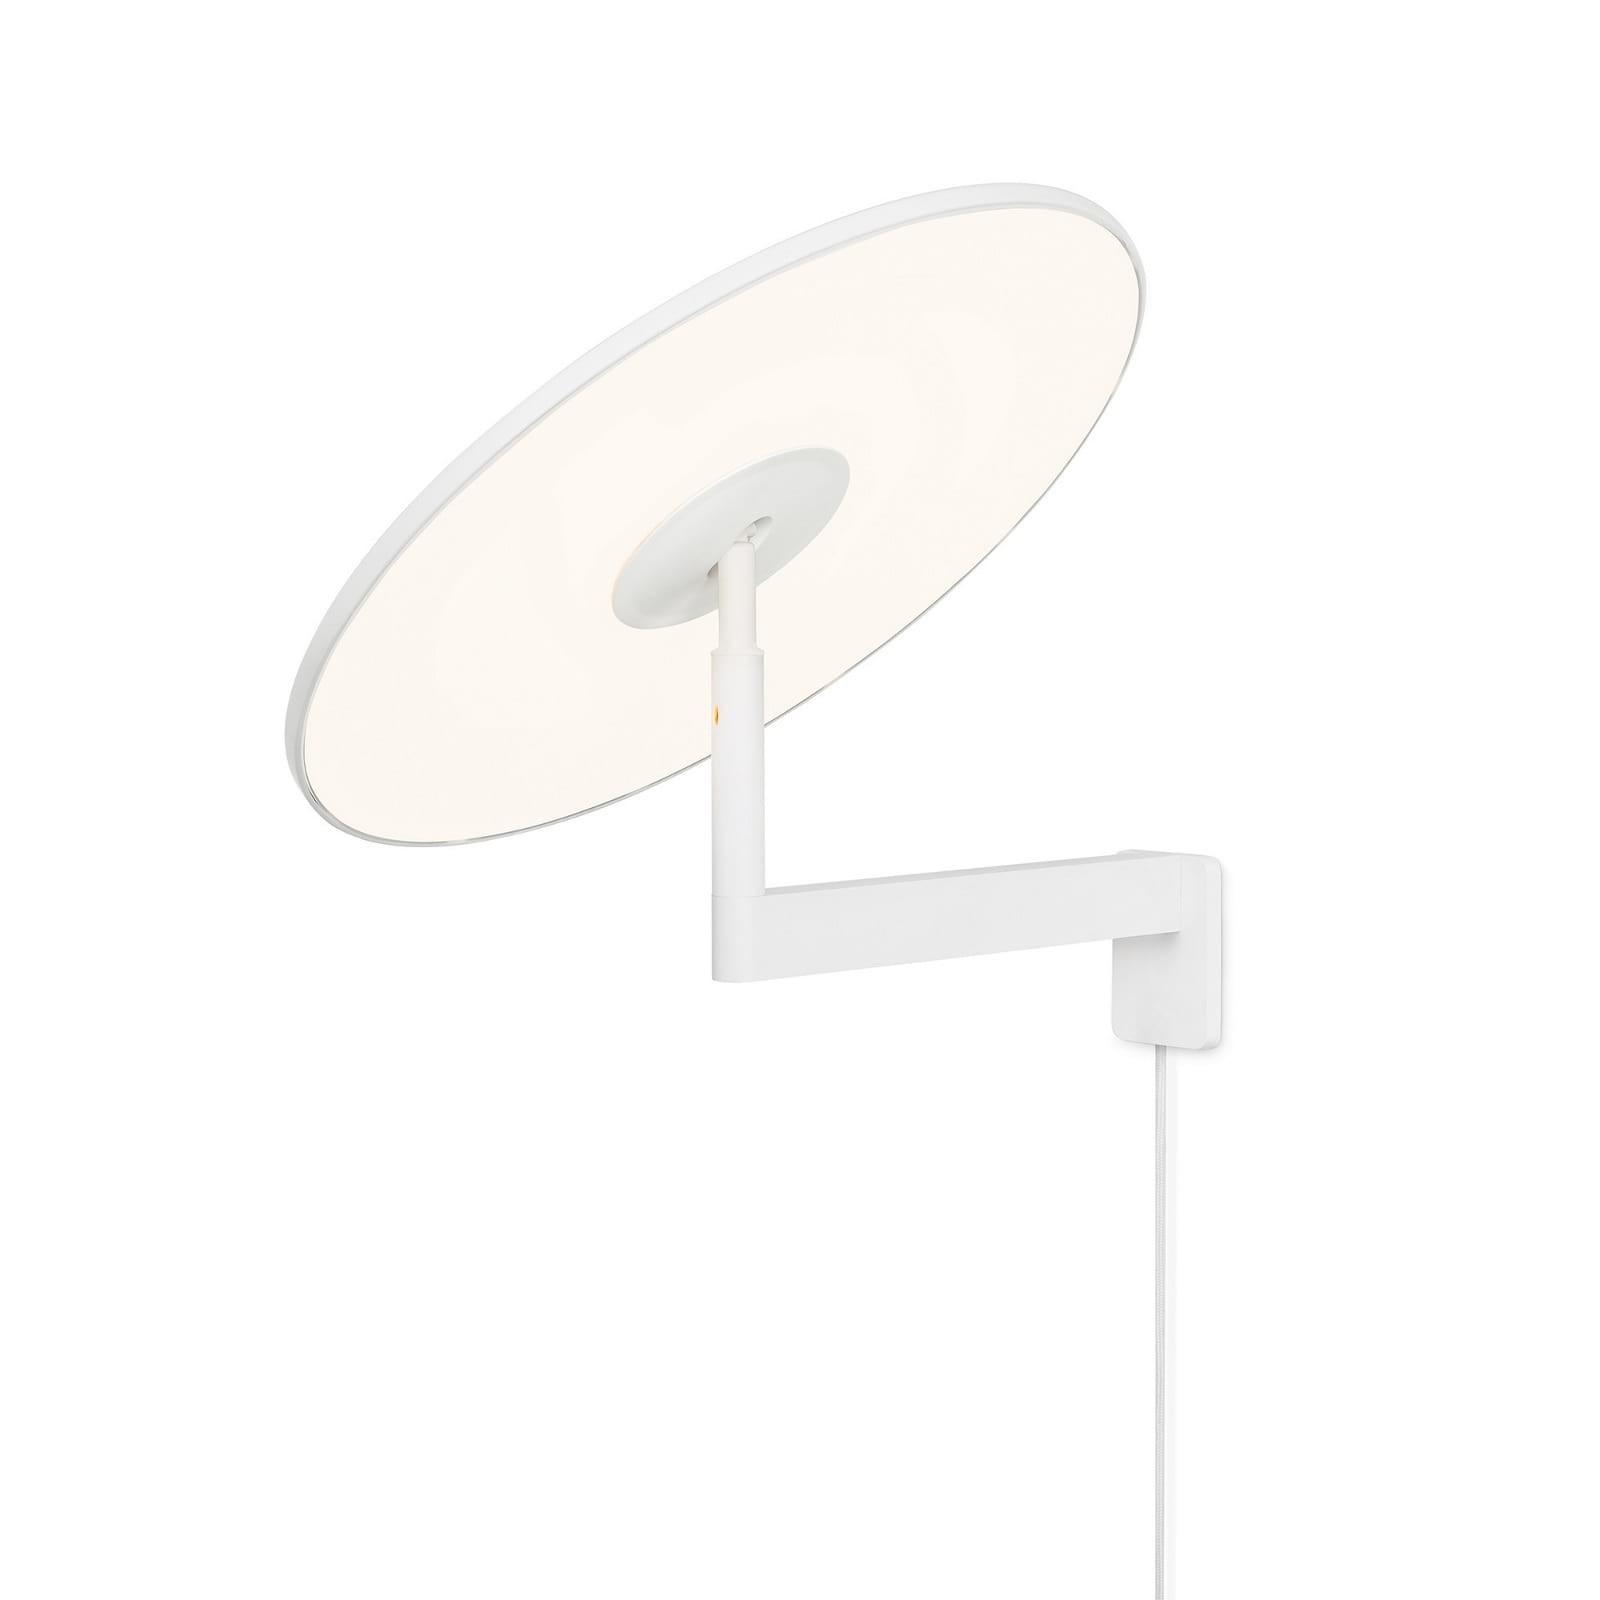 Circa 16 Φωτιστικό Τοίχου / Απλίκα LED (Λευκό) - Pablo Designs